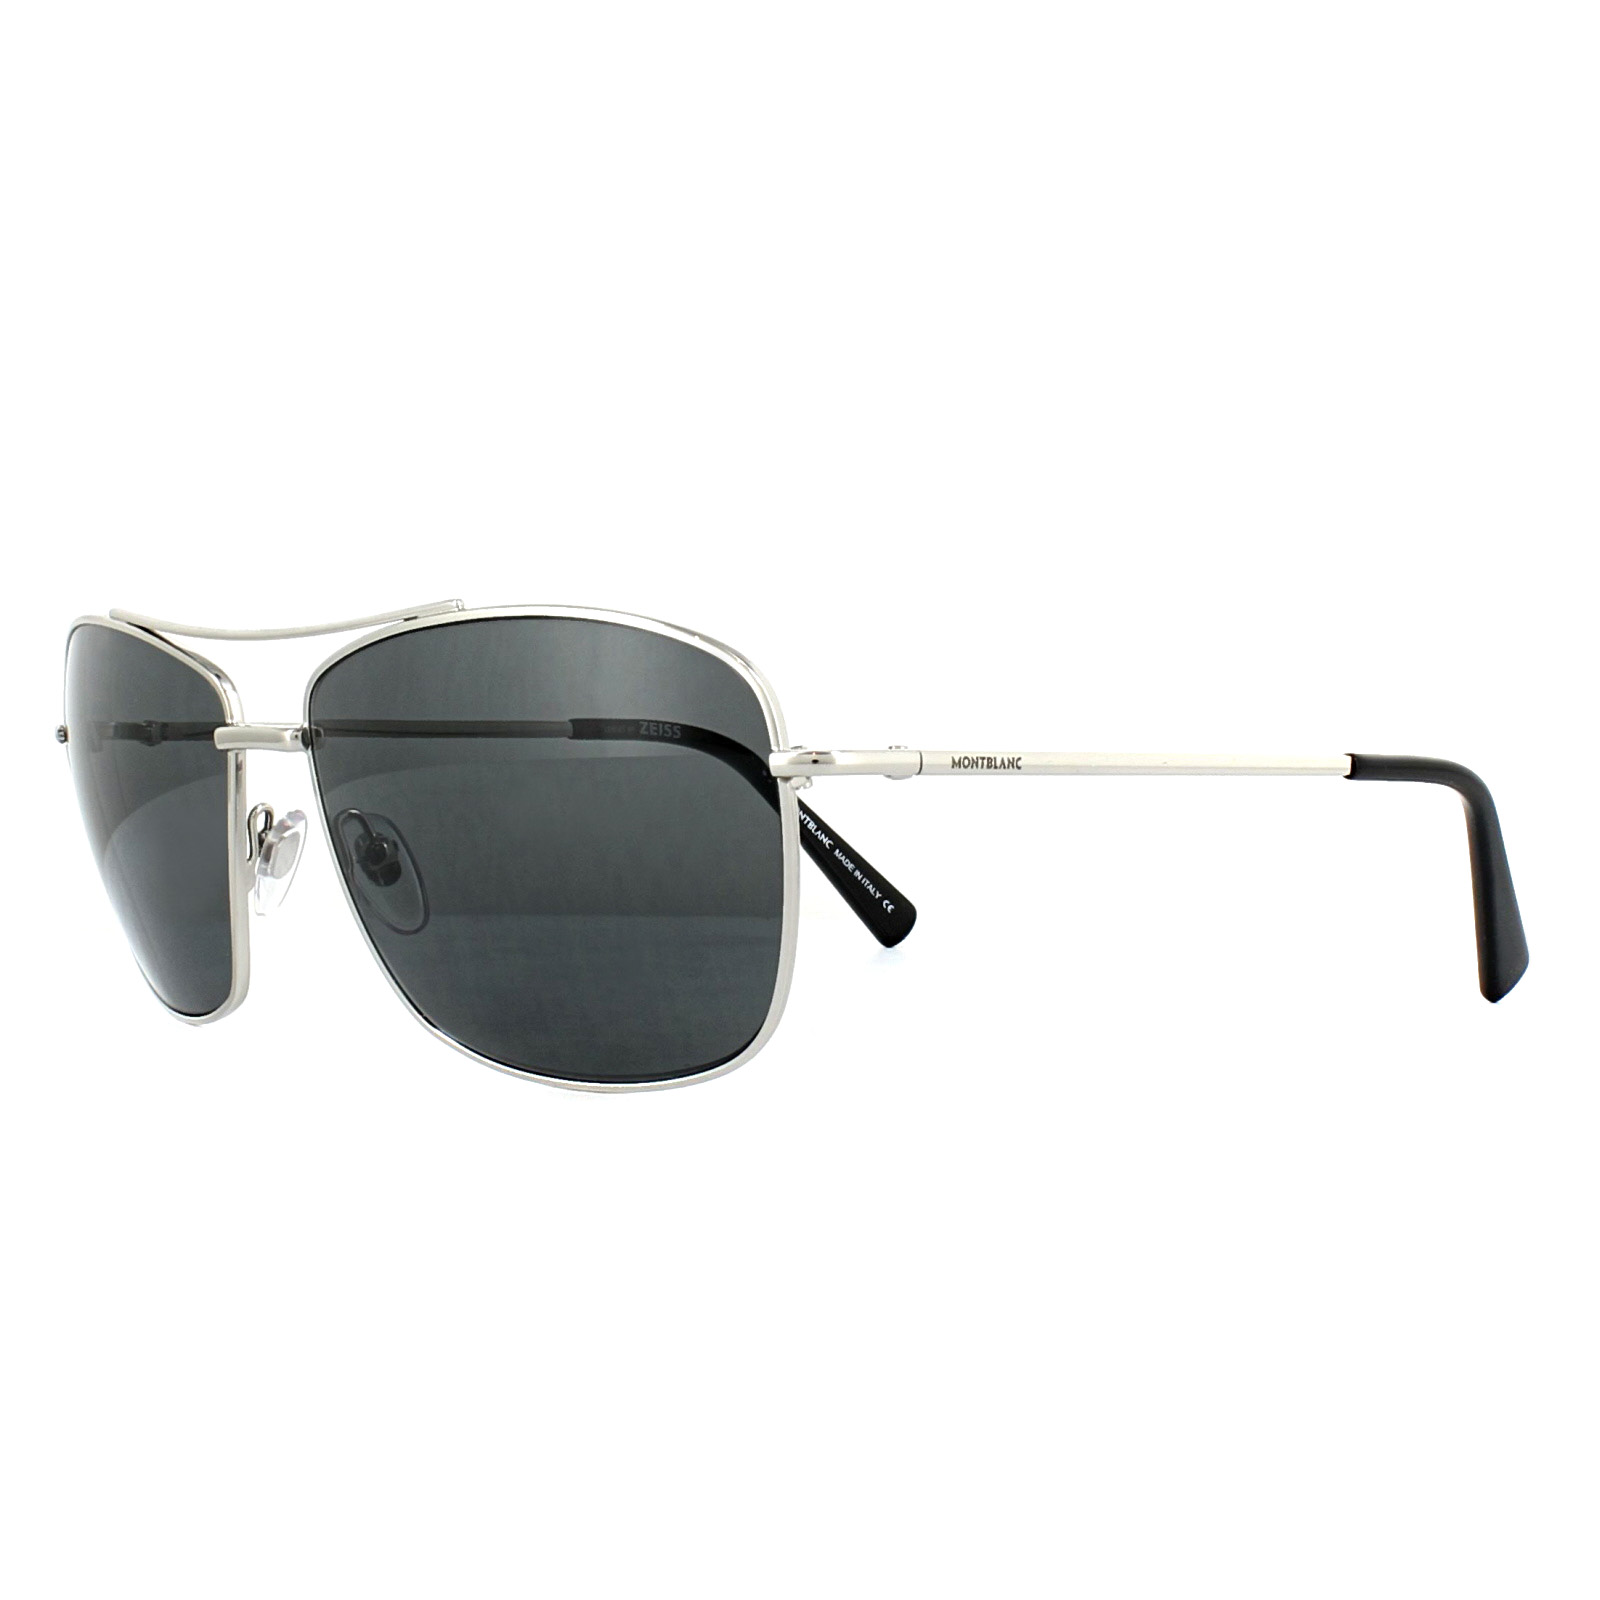 Mont Blanc Sunglasses MB548S 16A Silver Grey 664689707027   eBay 1c5a9174dc